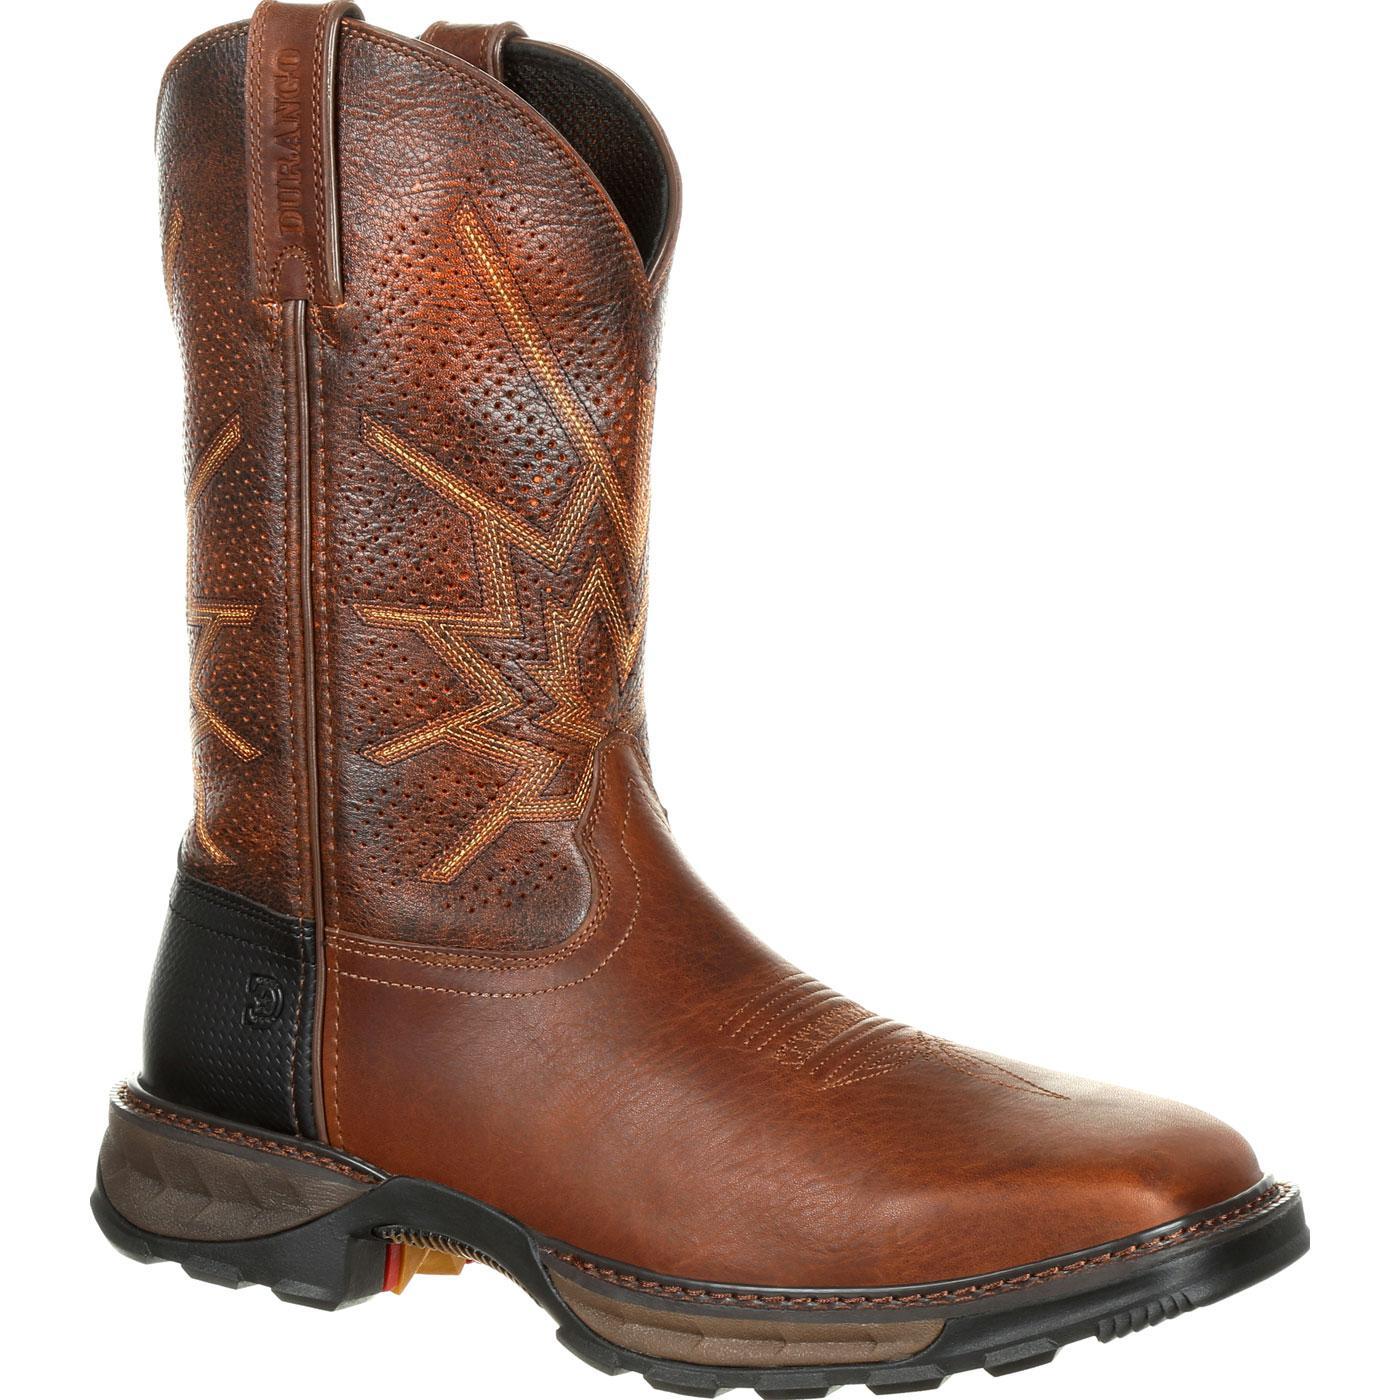 Durango Maverick Xp Steel Toe Ventilated Pull On Work Boot